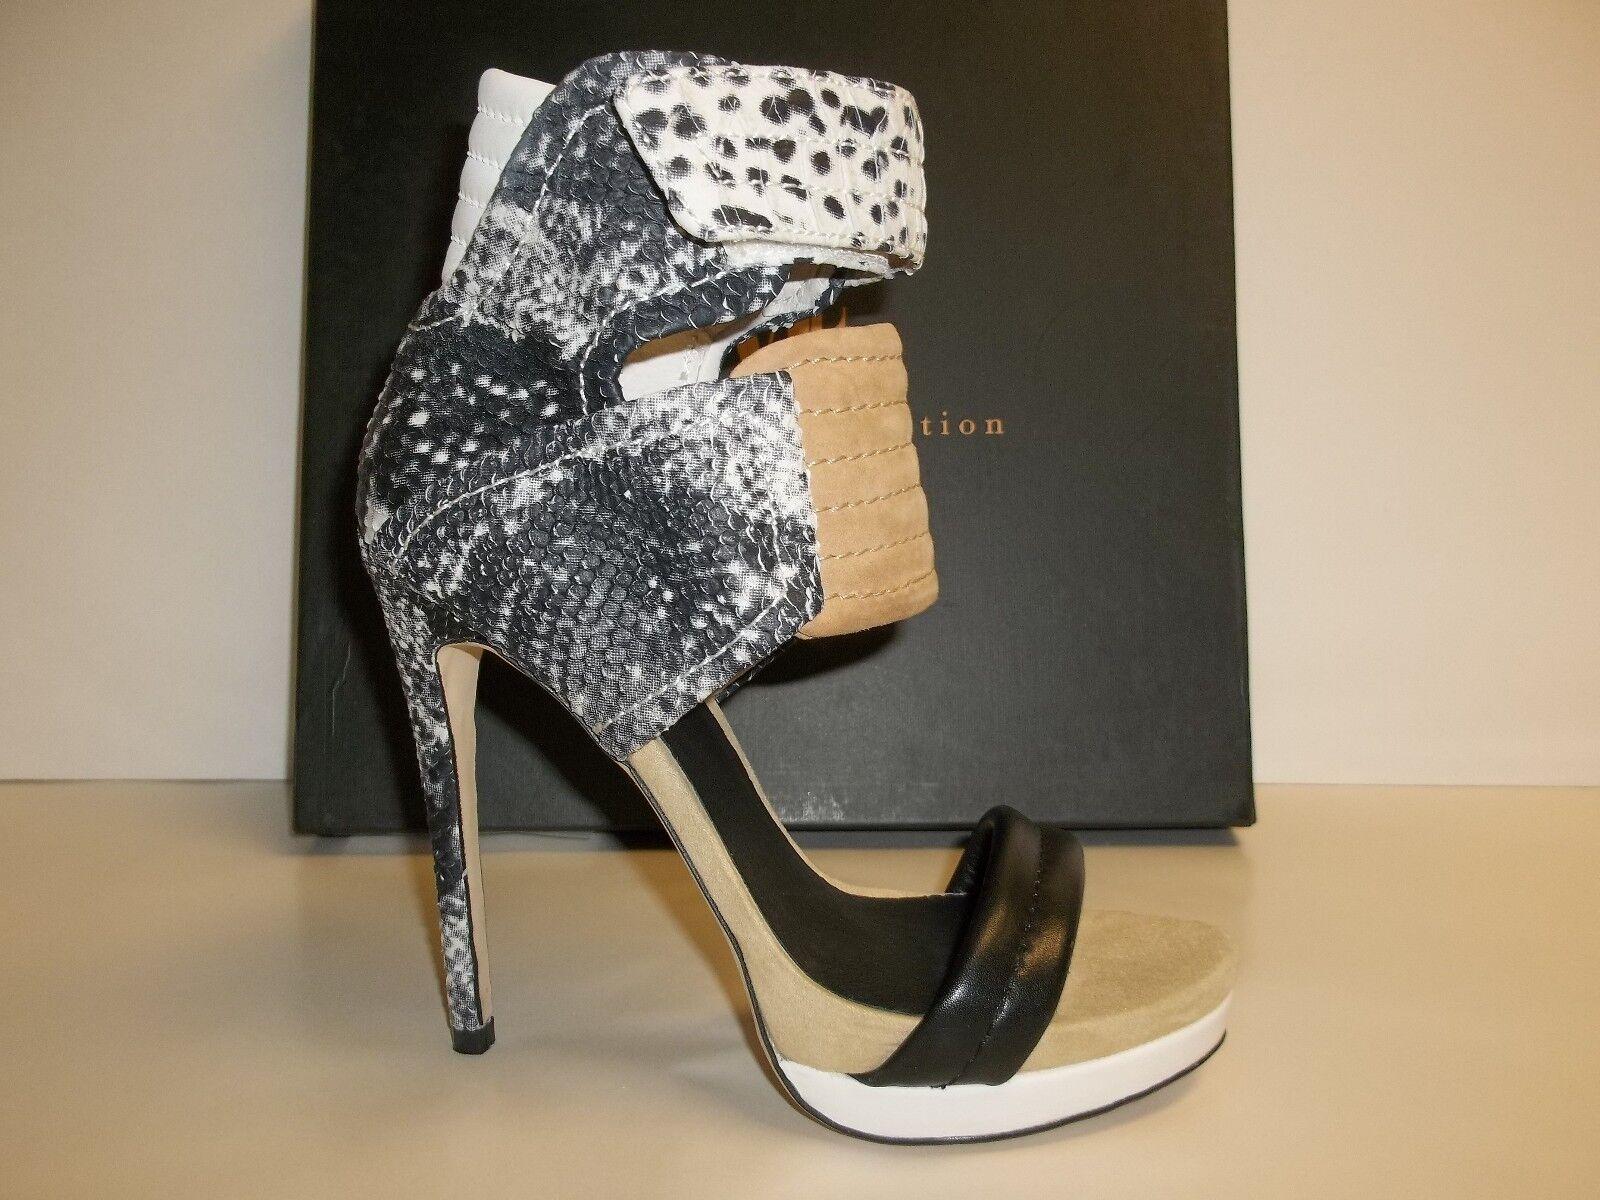 Mia Limited Edition Größe 7.5 M ROCCO Gray Leder Heels Sandales NEU Damenschuhe Schuhes